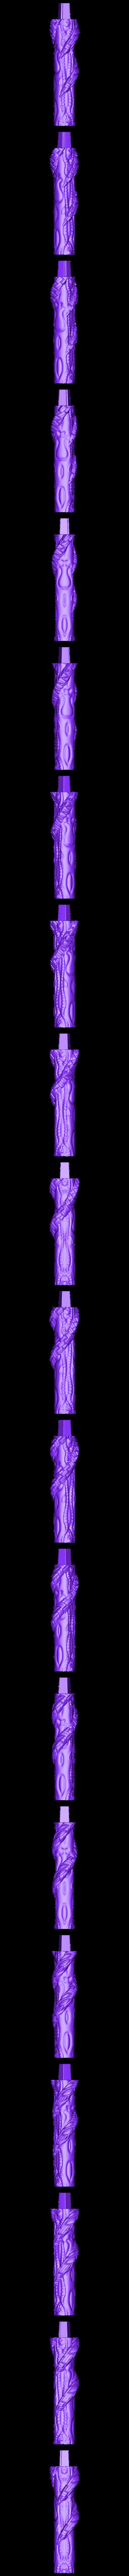 Aquaman_weapon_07.stl Download STL file Aquaman Trident Cosplay STL files - Costume Weapons 3D Printing • 3D printing design, 3DPrintModelStoreSS